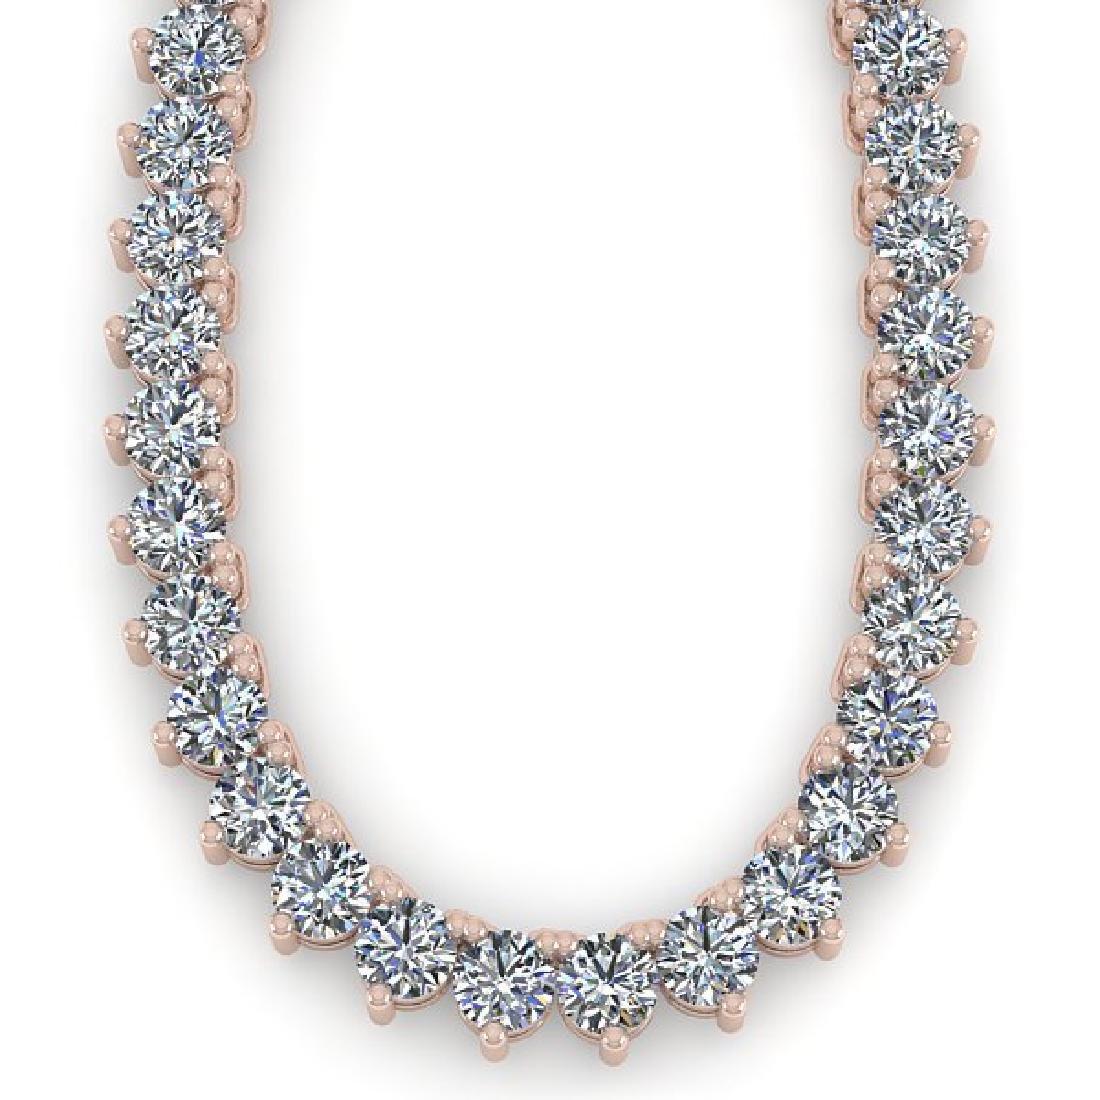 20 CTW Solitaire VS/SI Diamond Necklace 18K Rose Gold - 2